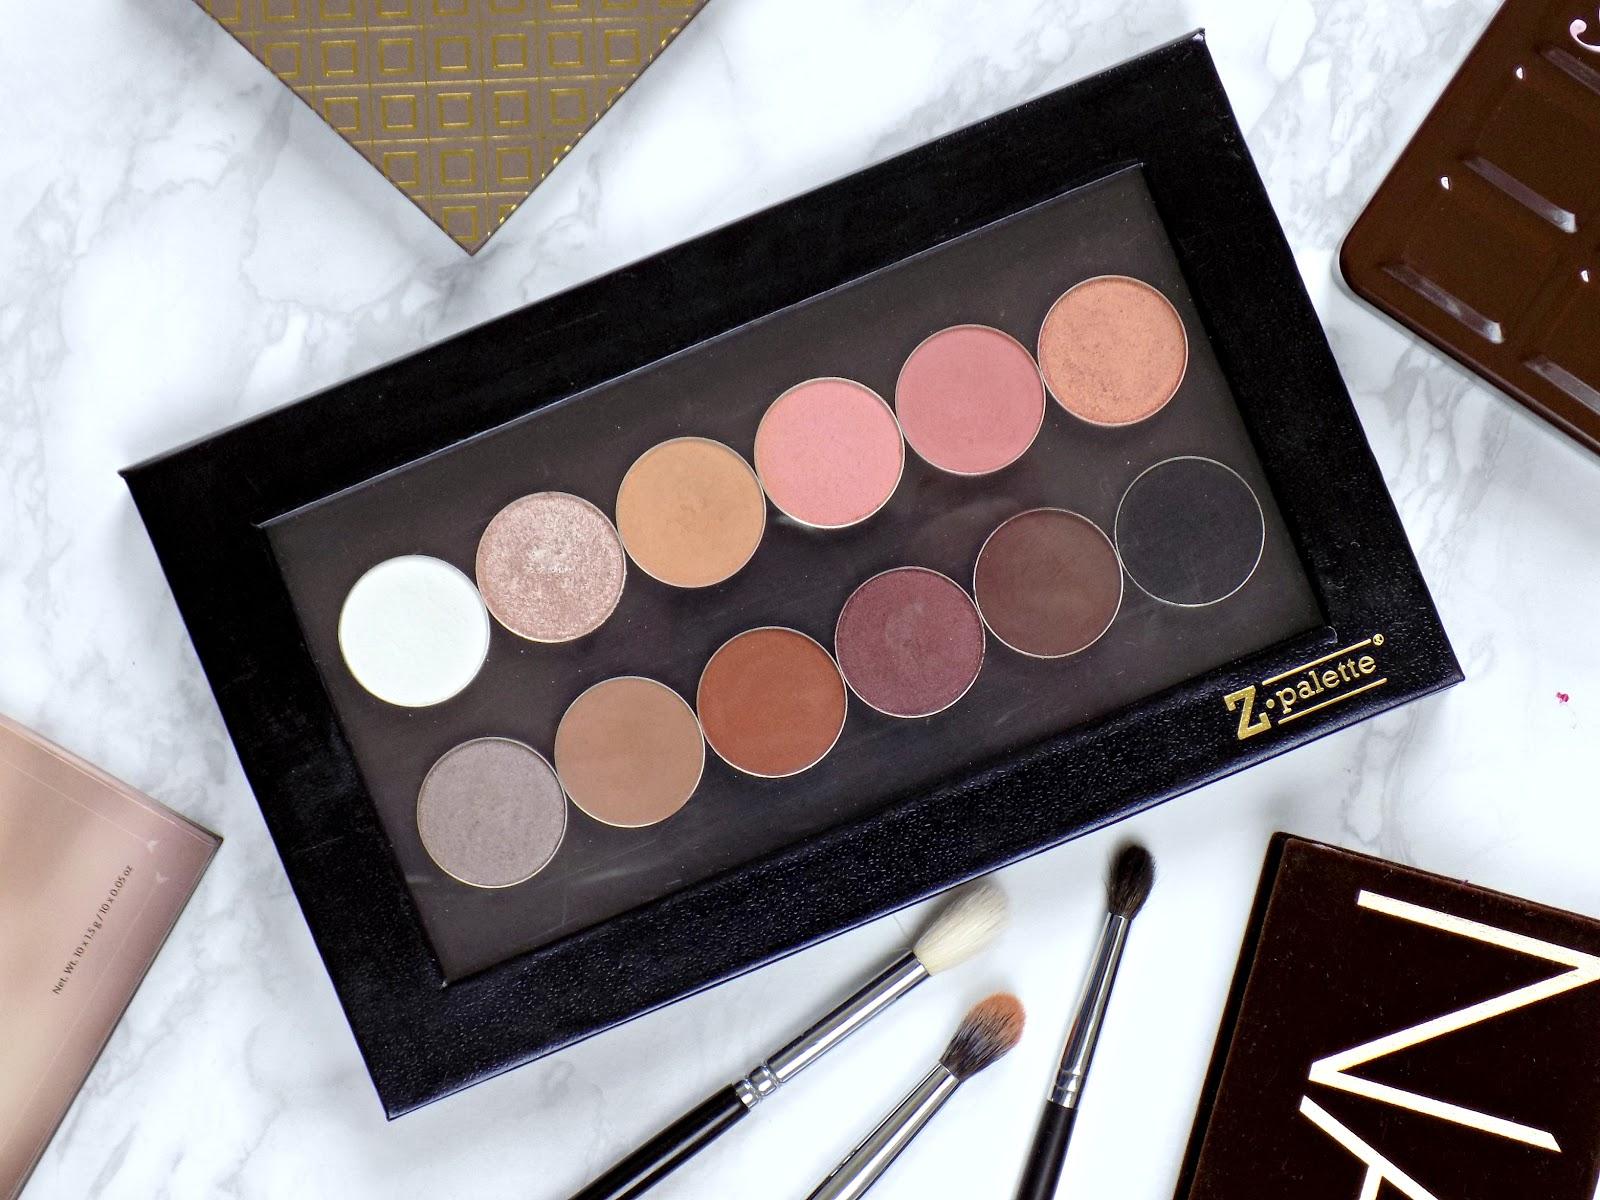 Makeup palette creator